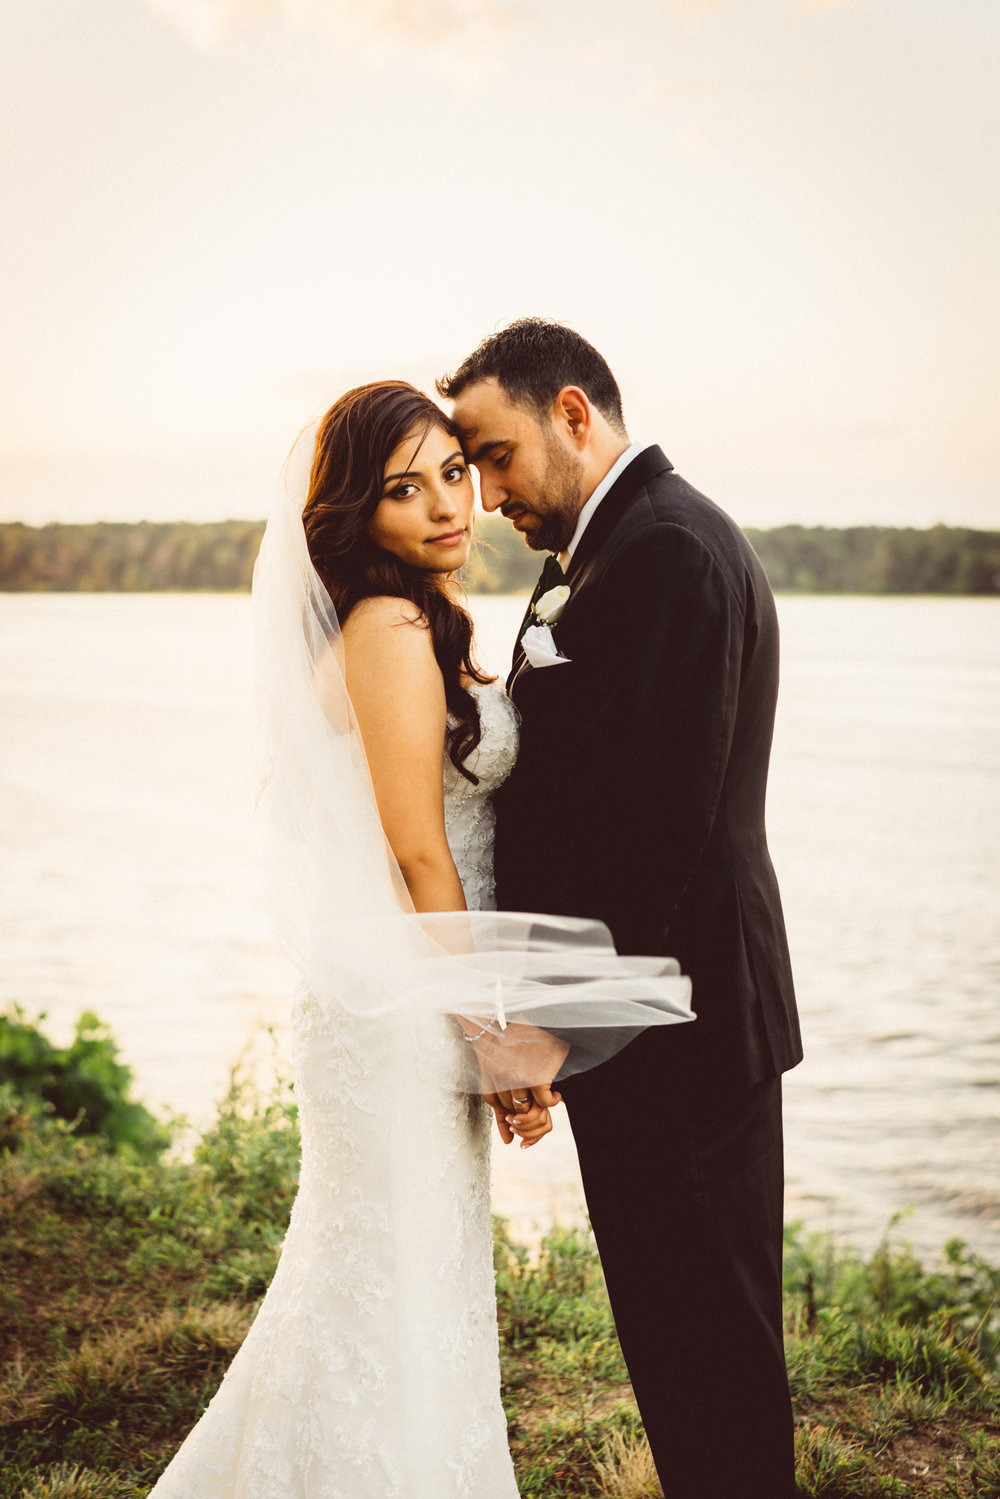 Mike_Steinmetz_Virginia_Wedding_Photographer_Favorites-30.jpg